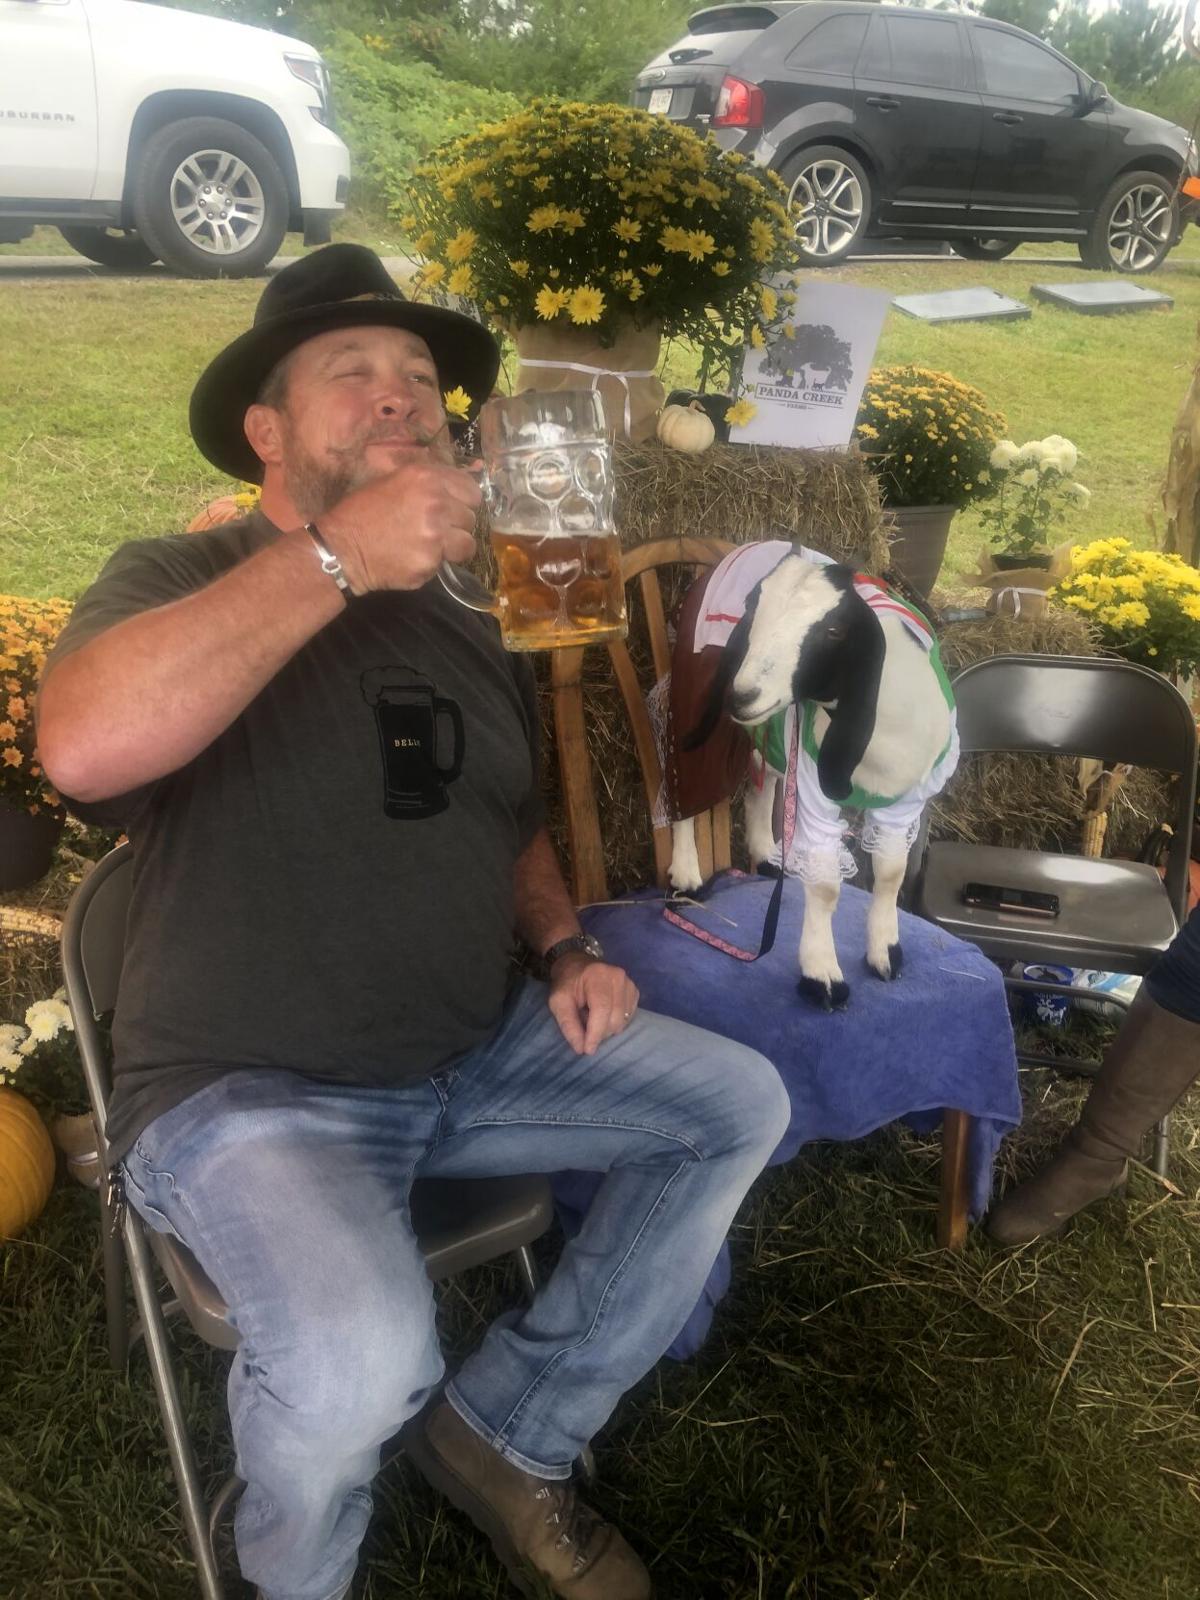 Goats and brews at Goatoberfest